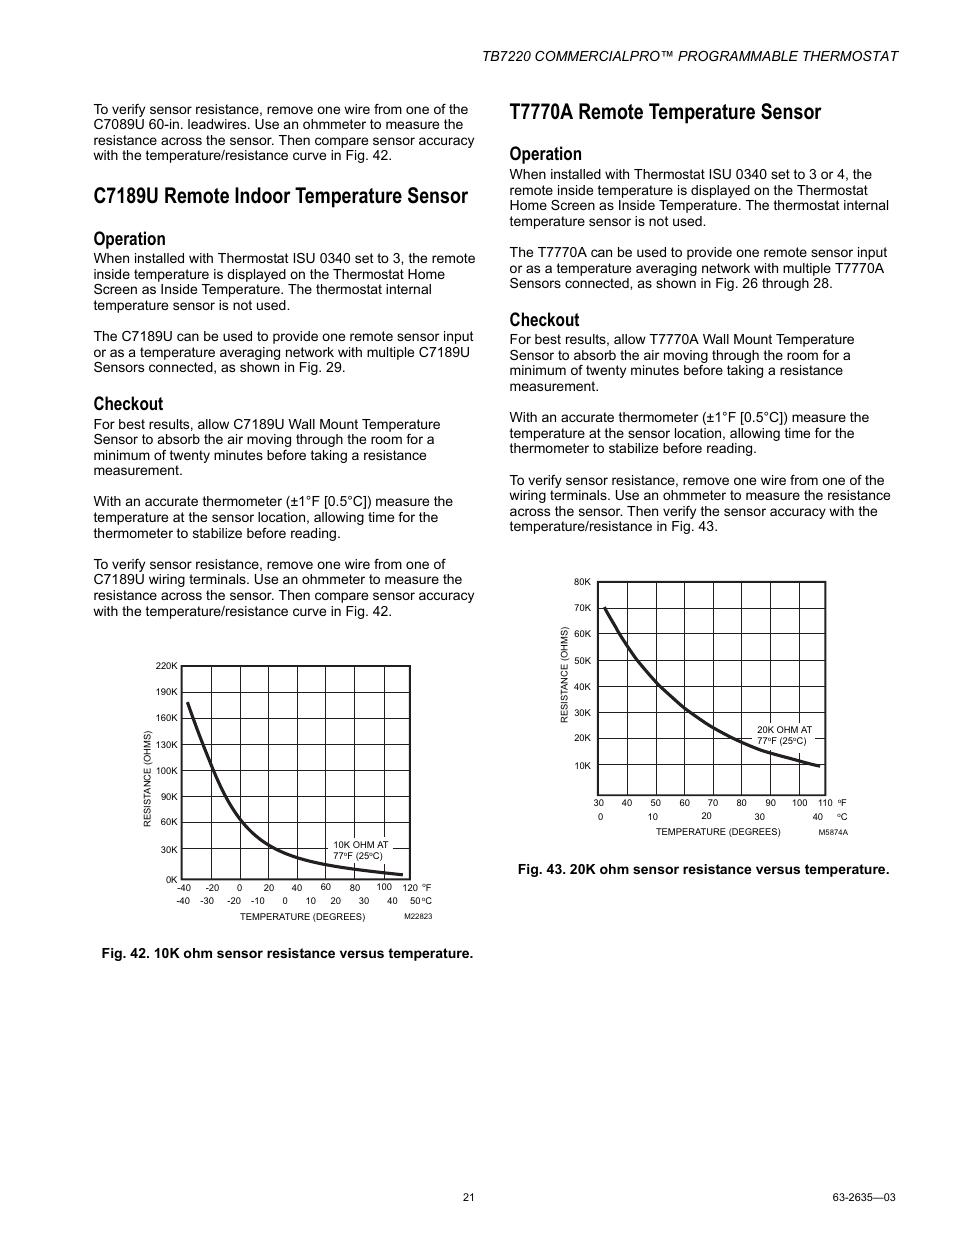 c7189u remote indoor temperature sensor  t7770a remote